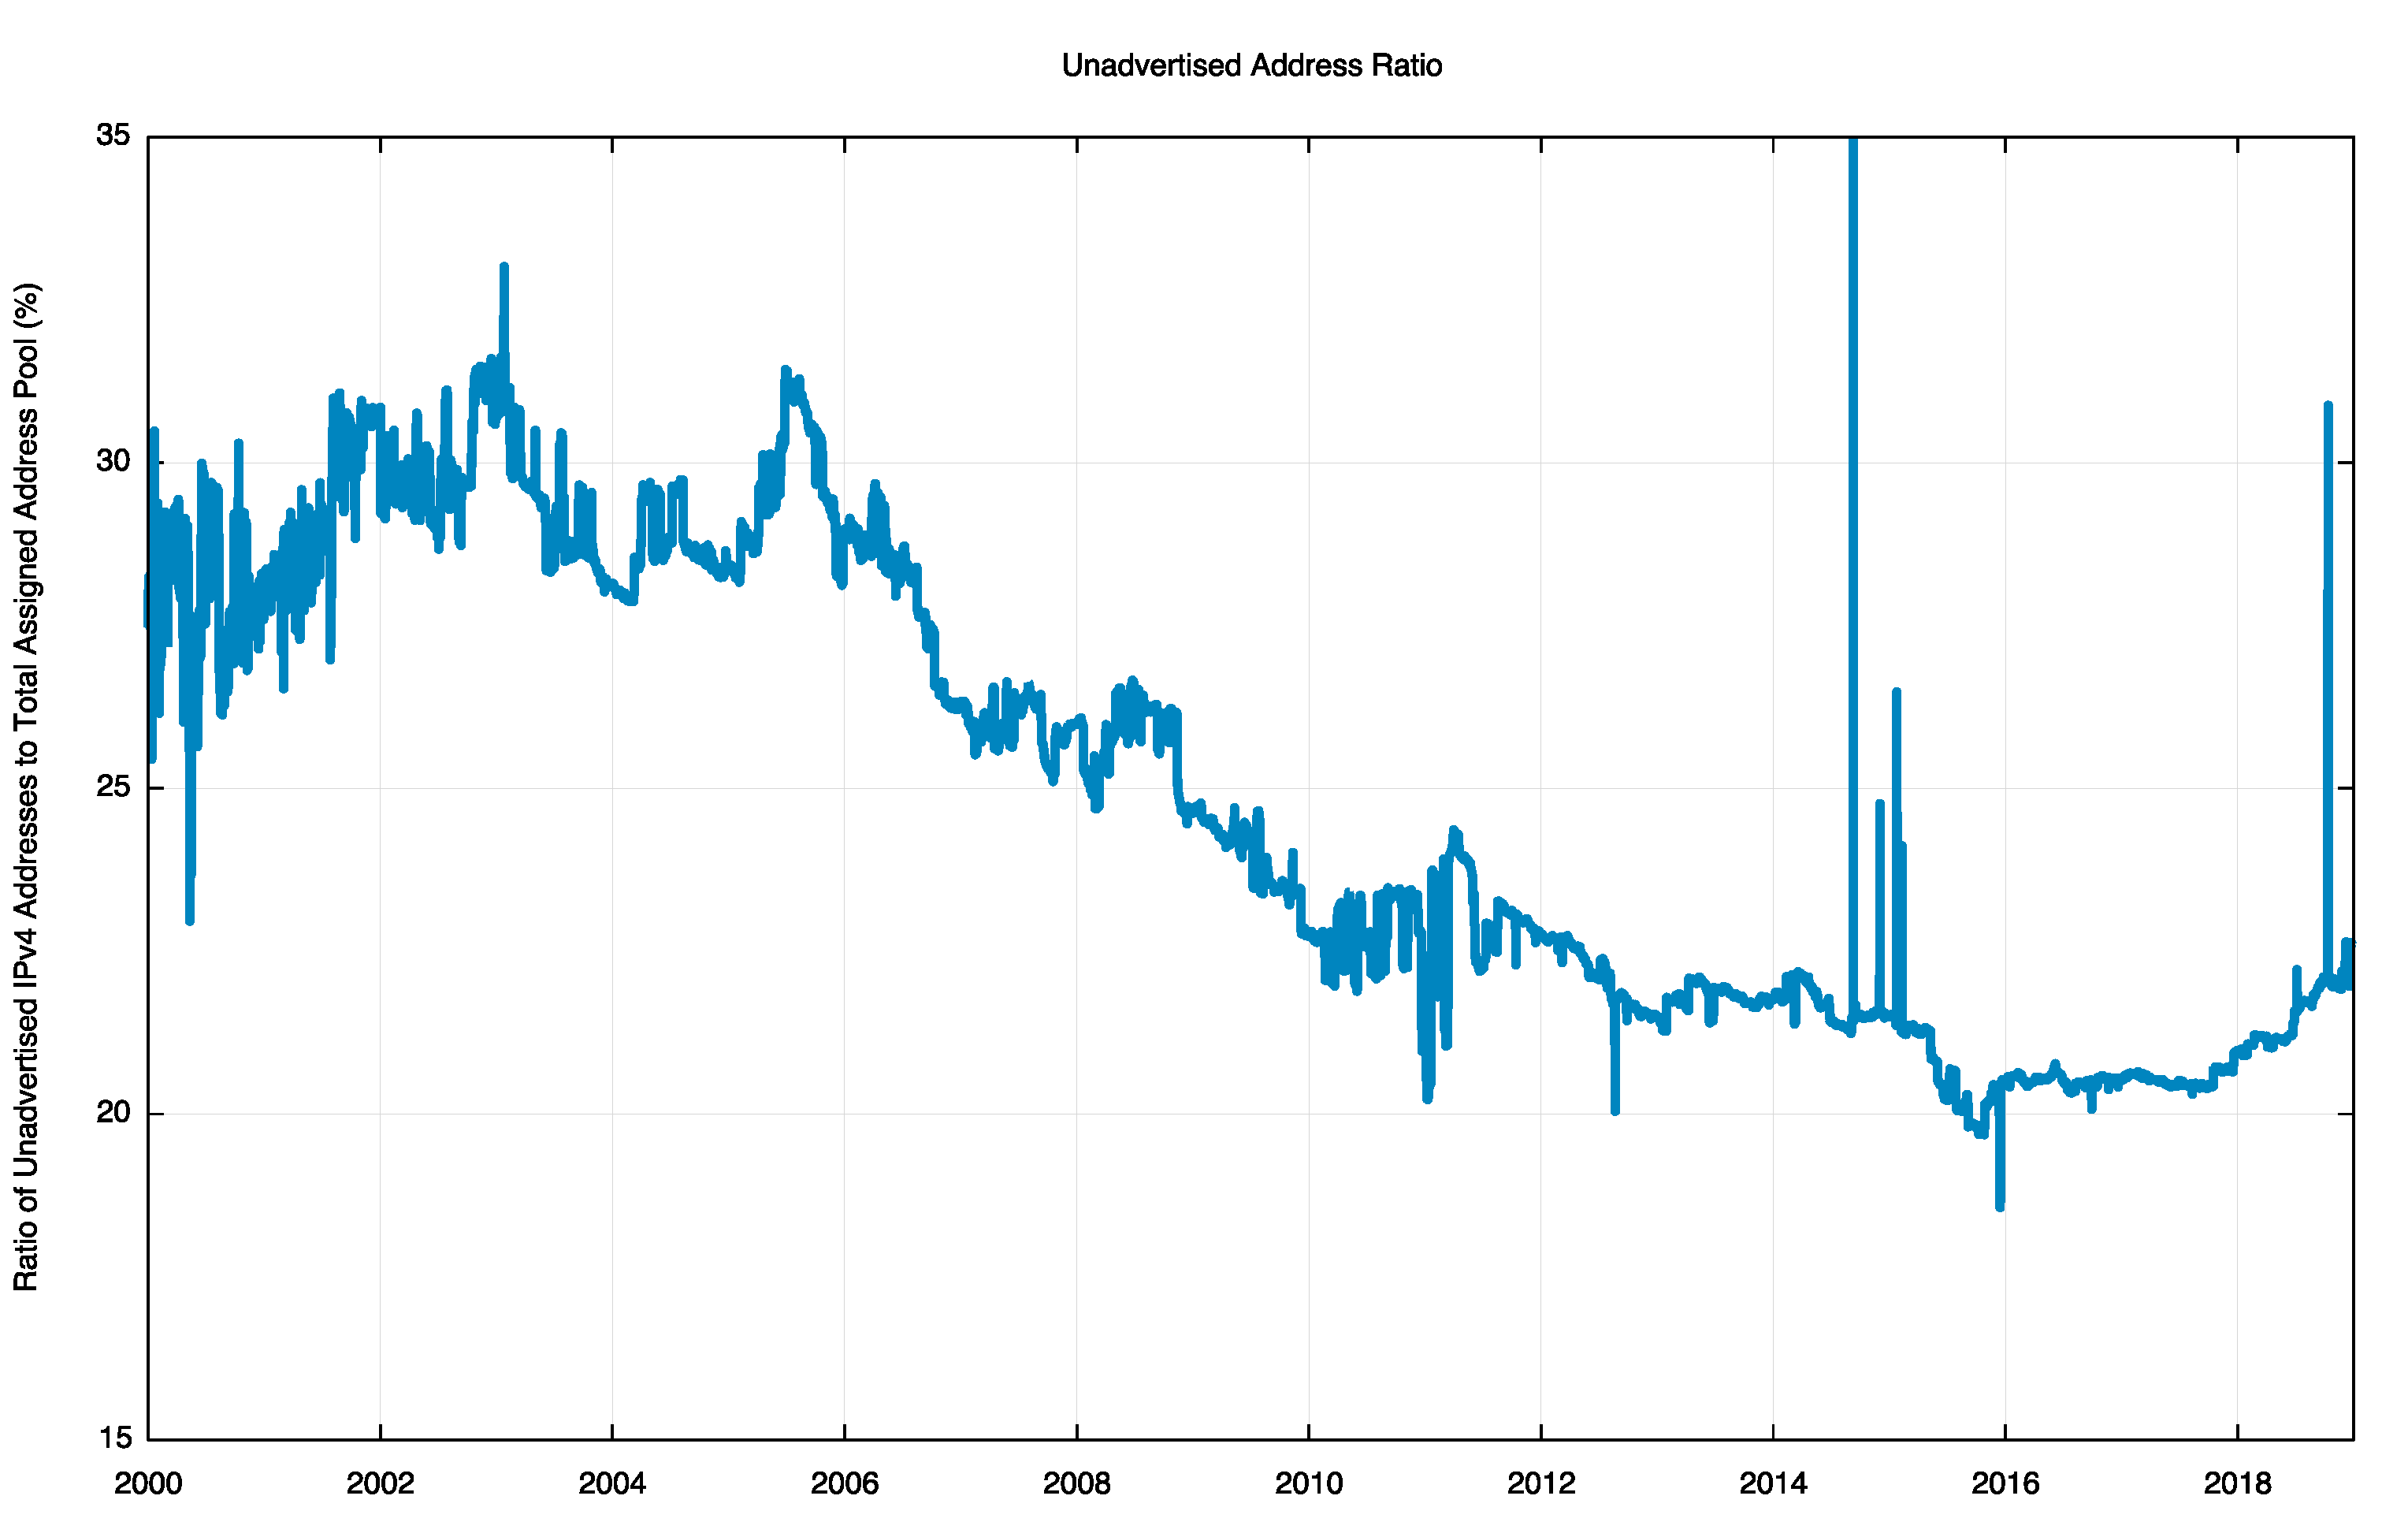 Figure 6 — Ratio of unadvertised pool to total pool